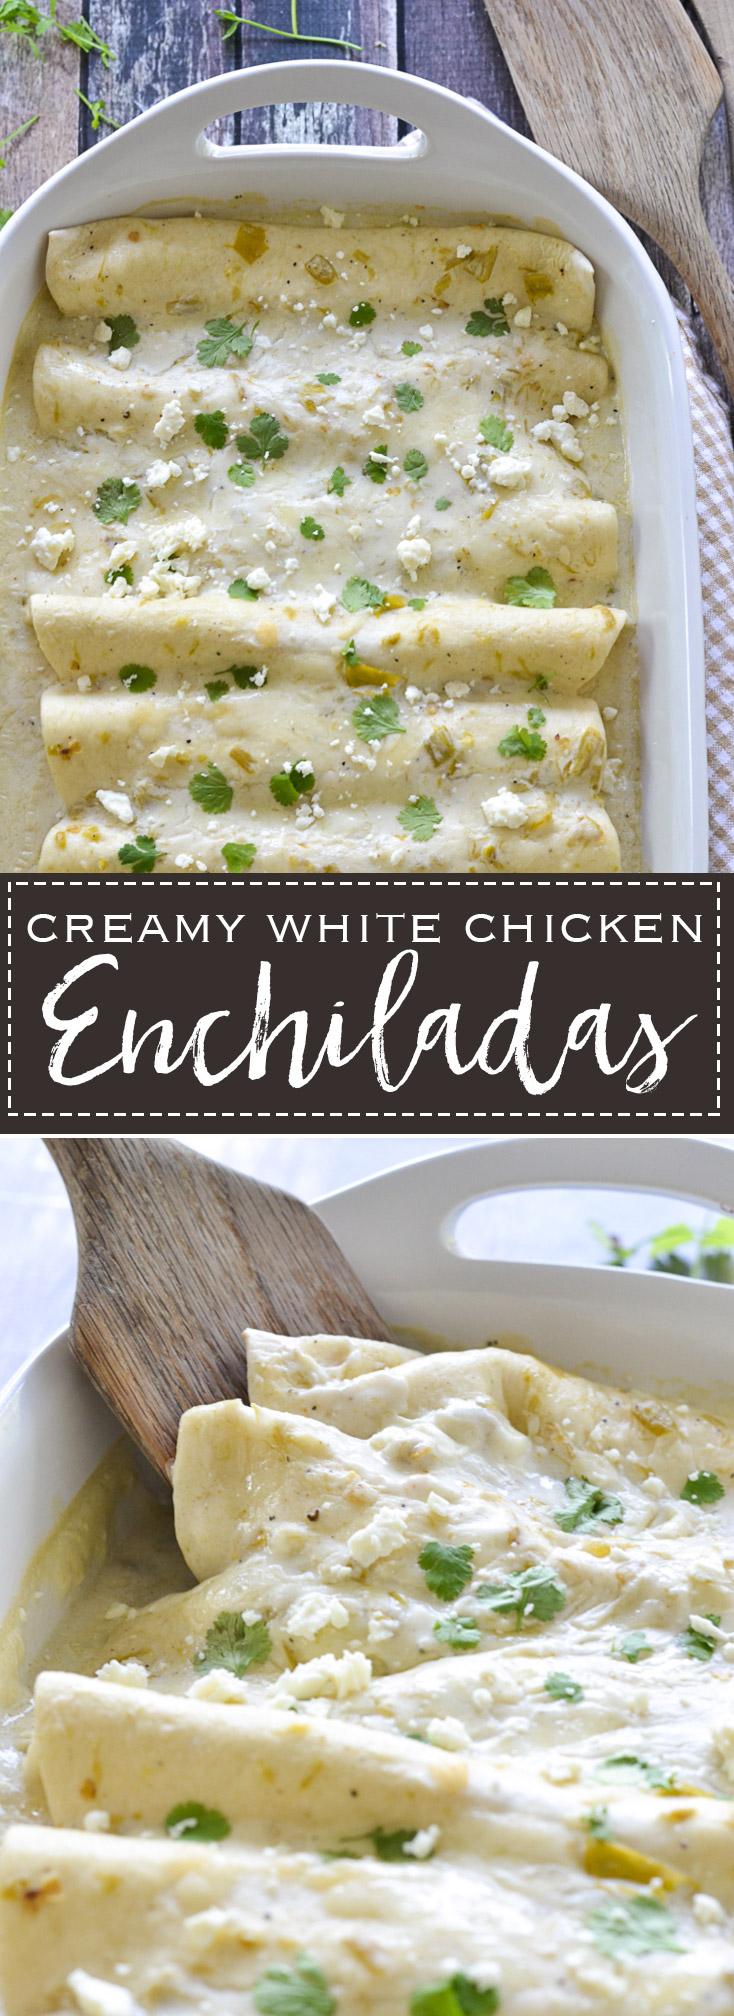 Creamy White Chicken Enchiladas   www.motherthyme.com